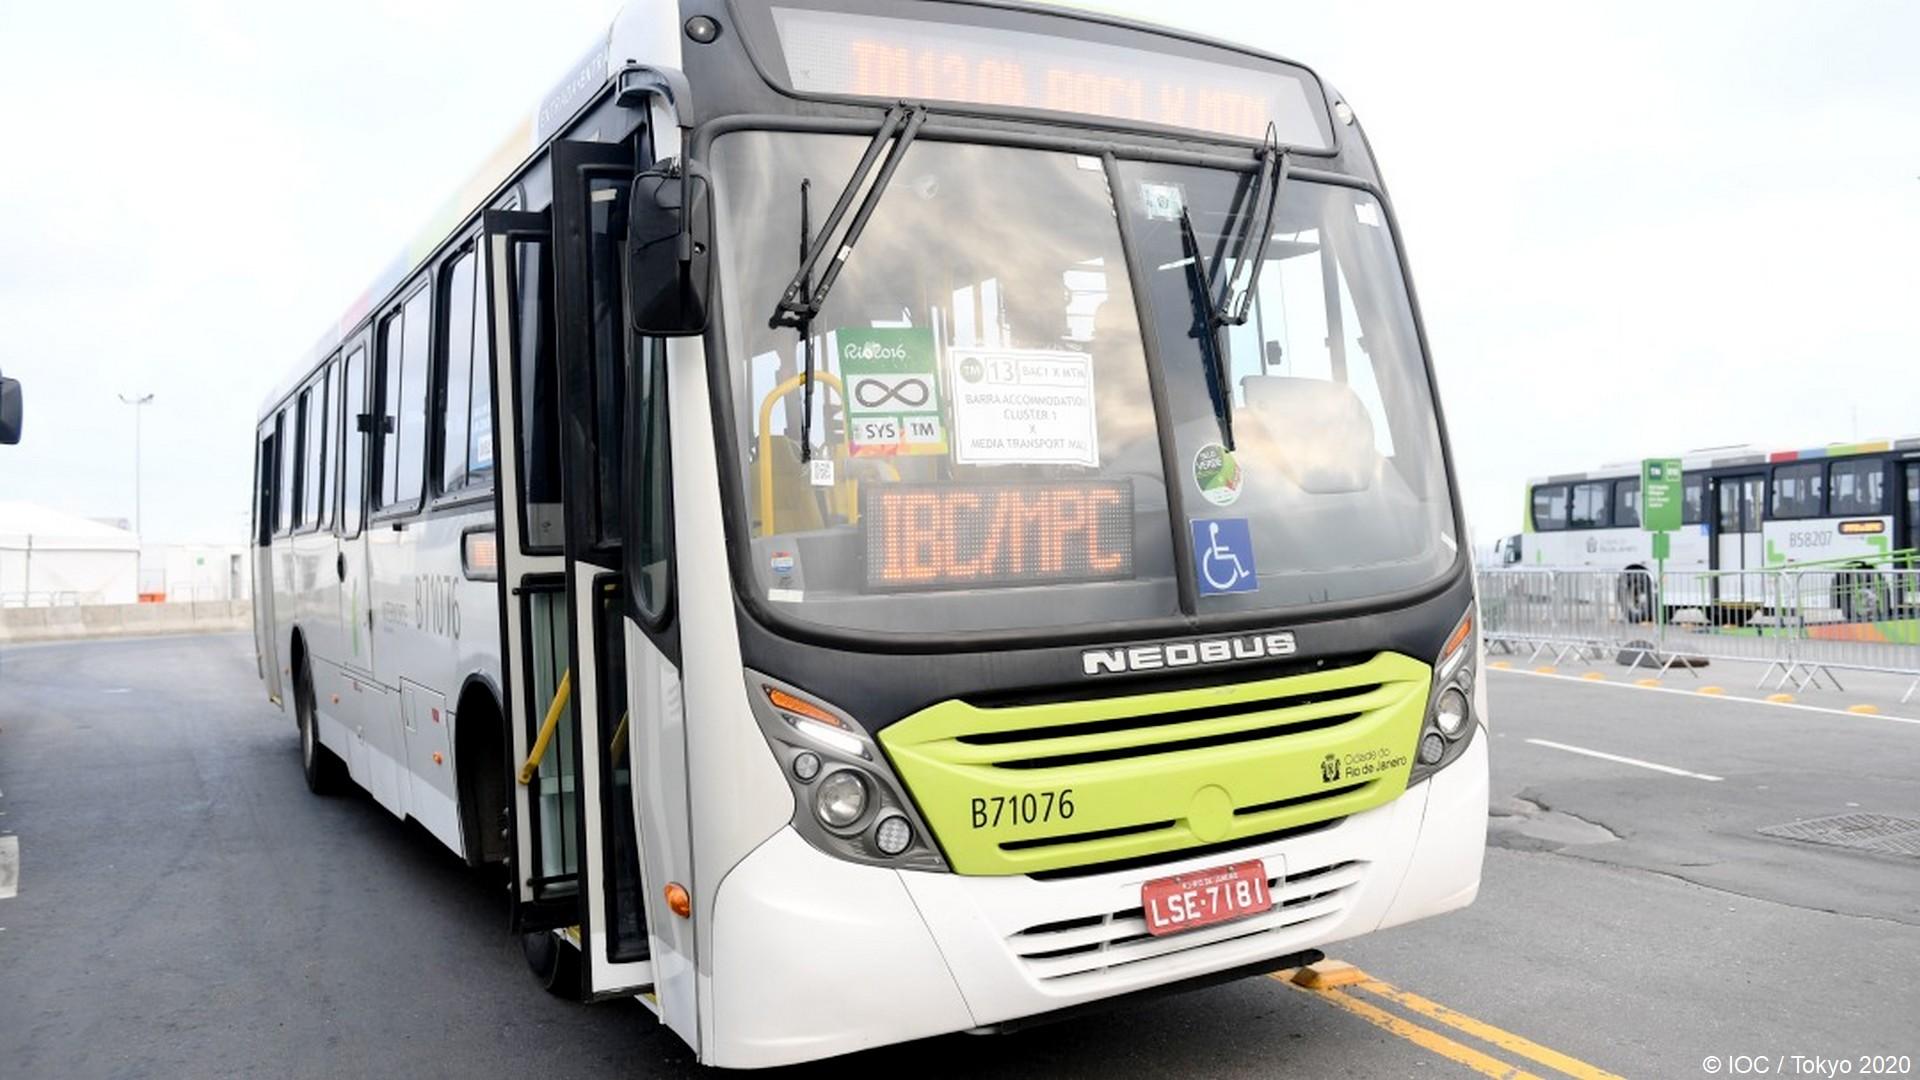 Tokyo 2020 – Transport bus